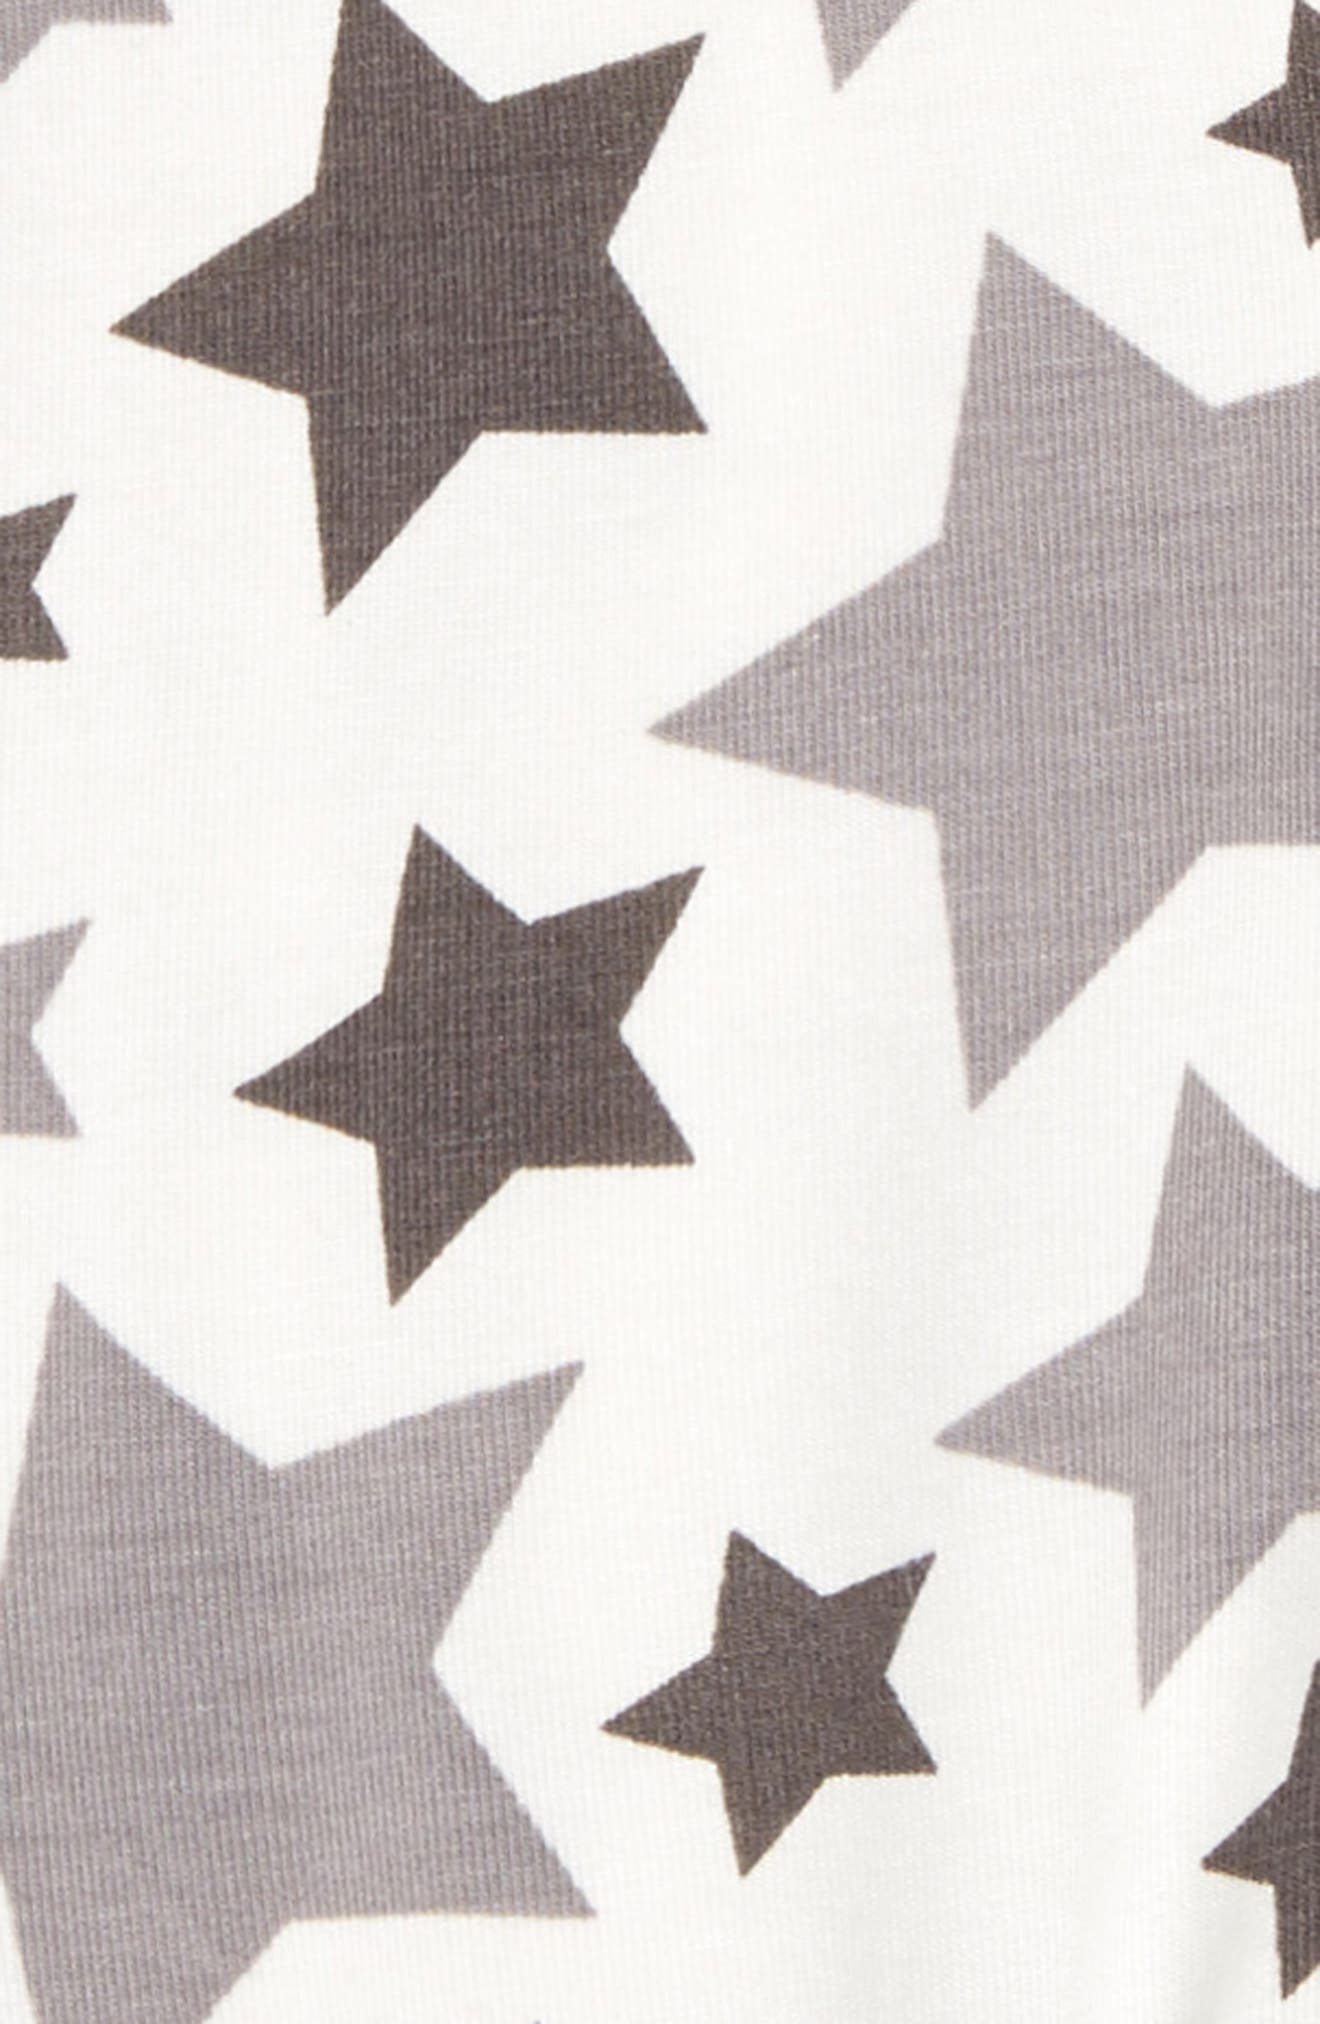 Star Print Footie,                             Alternate thumbnail 2, color,                             Feather Rain Stars